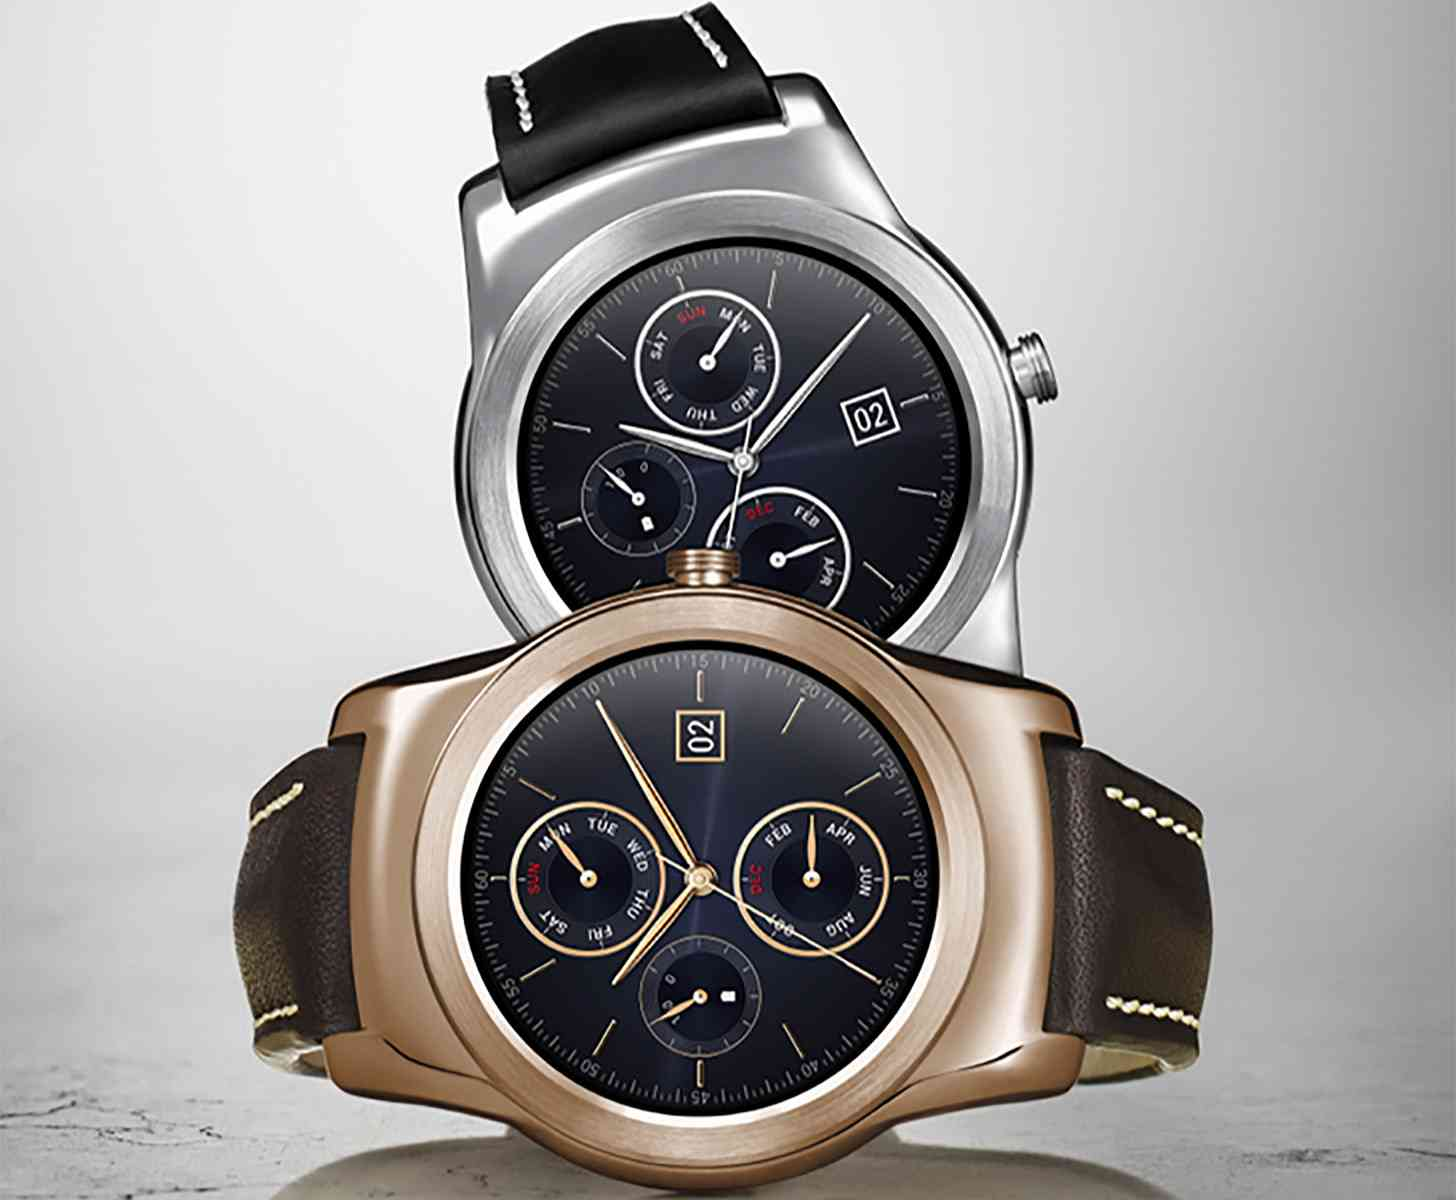 LG Watch Urbane colors